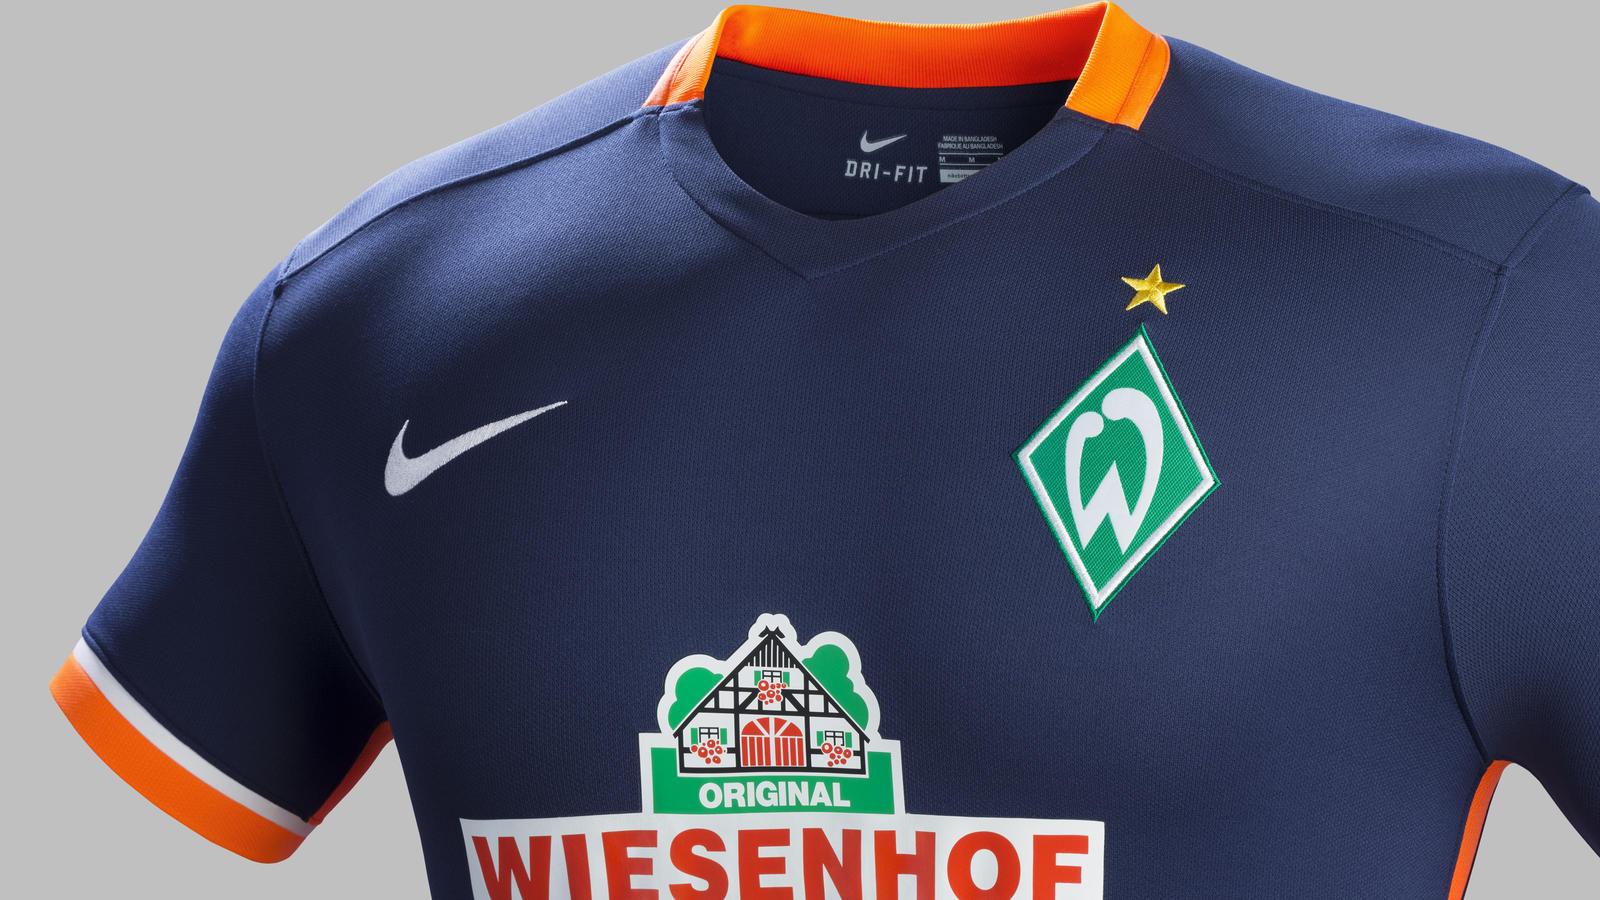 00e5dd11d53 Fa15 Club Kits PR Stadium Crest A Werder Bremen R. New Werder Bremen 2015-16  away shirt. Fa15 Club Kits PR Stadium Venting A Werder Bremen R